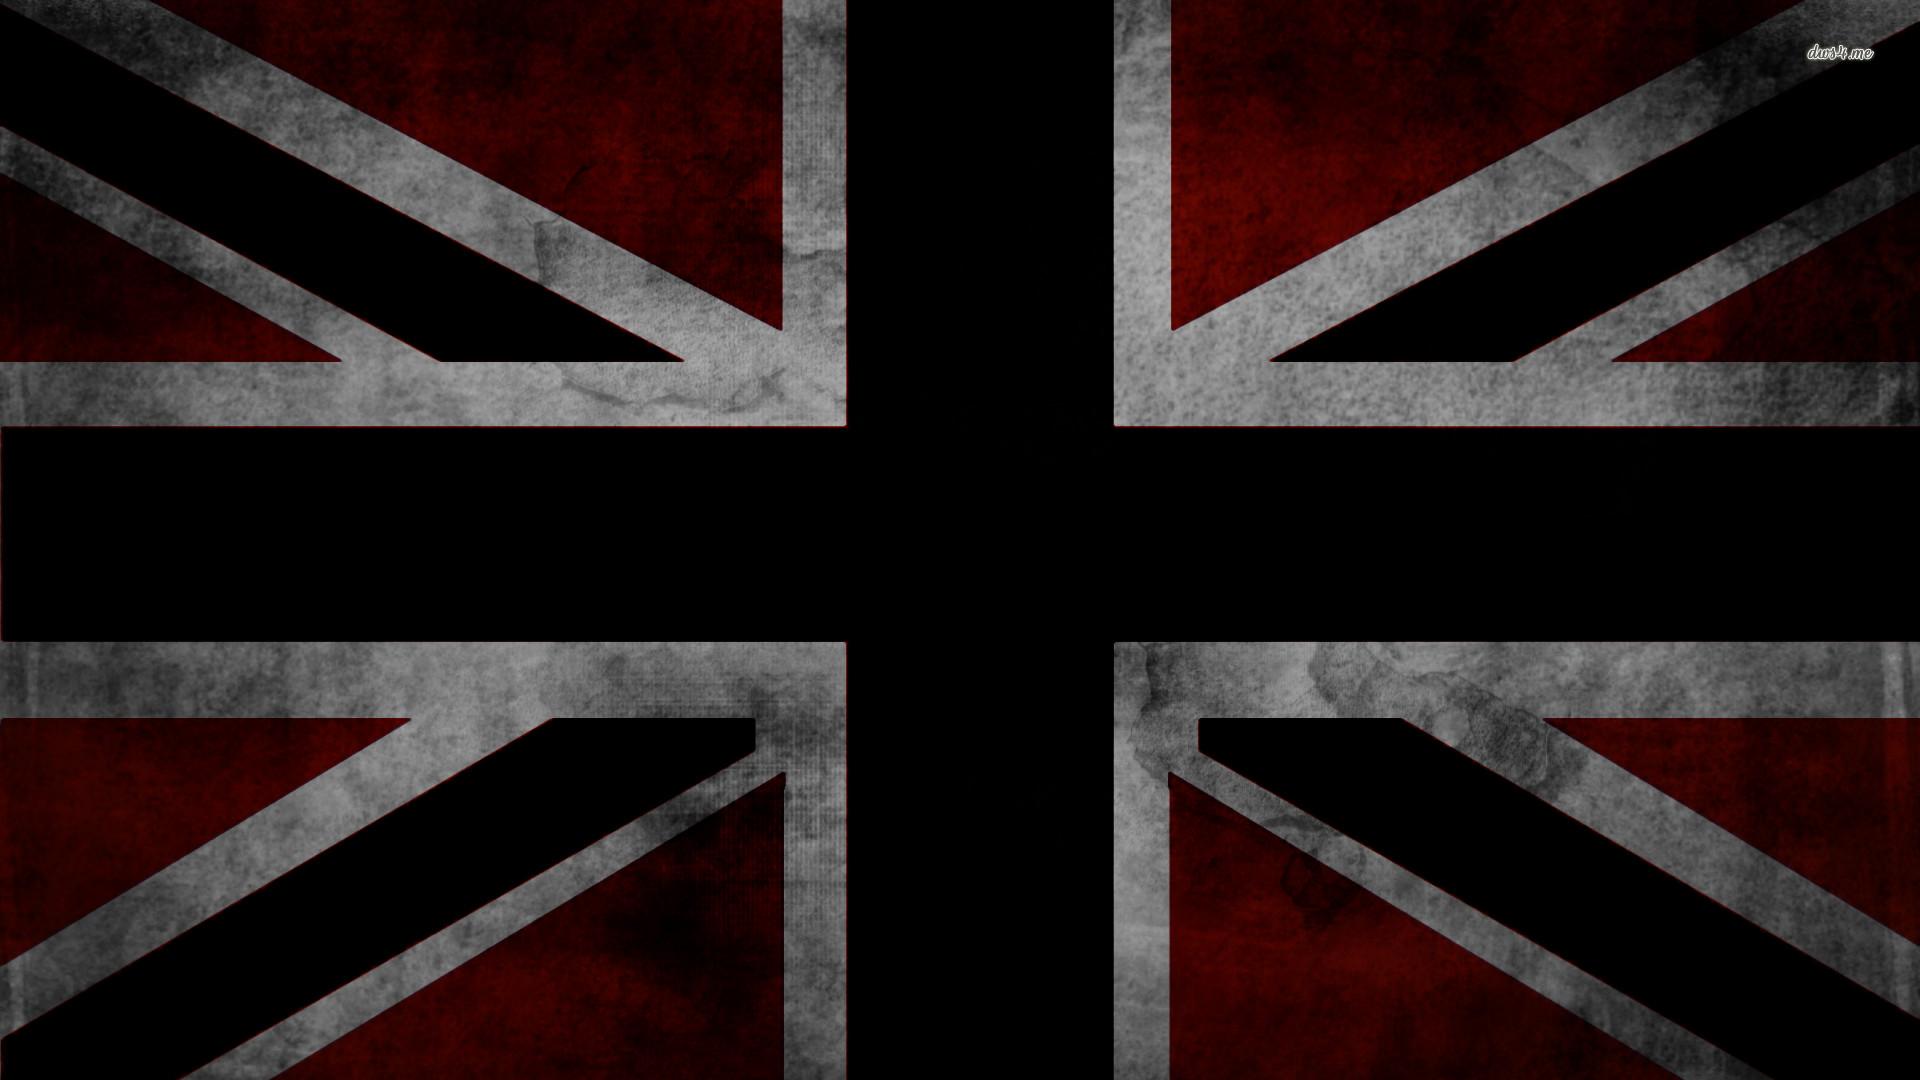 British Flag Background (51+ Images